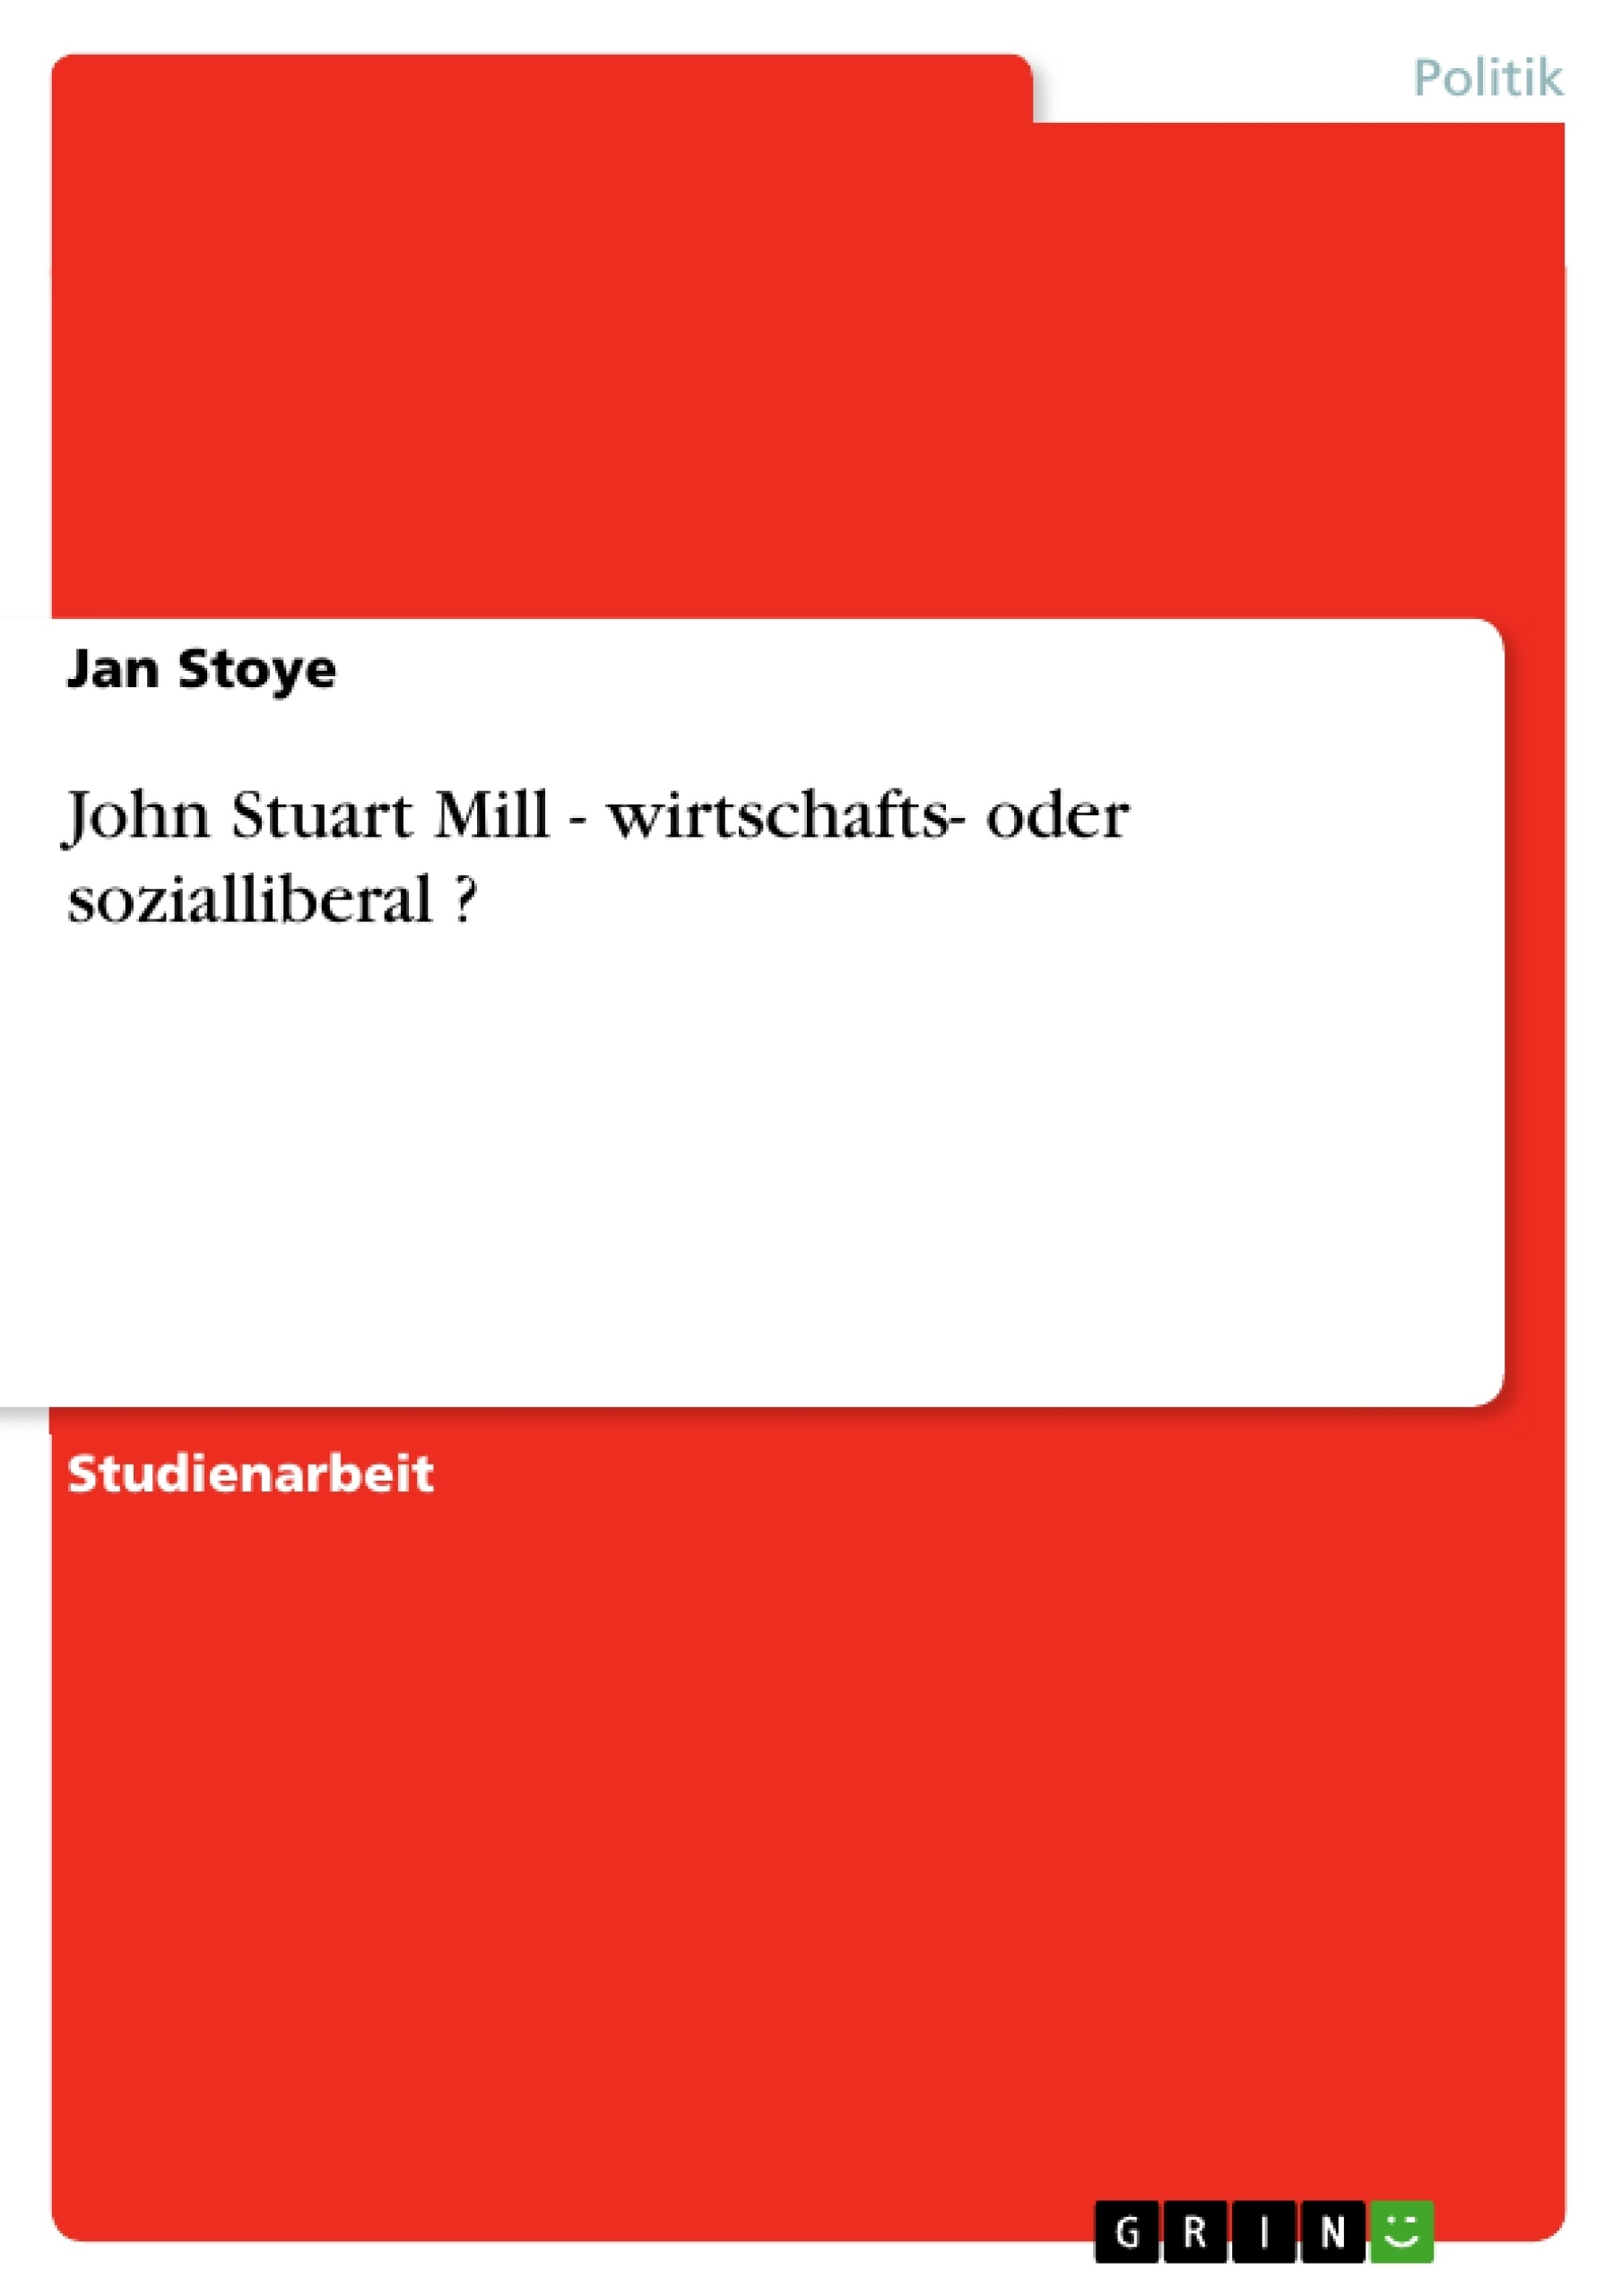 Titel: John Stuart Mill - wirtschafts- oder sozialliberal ?